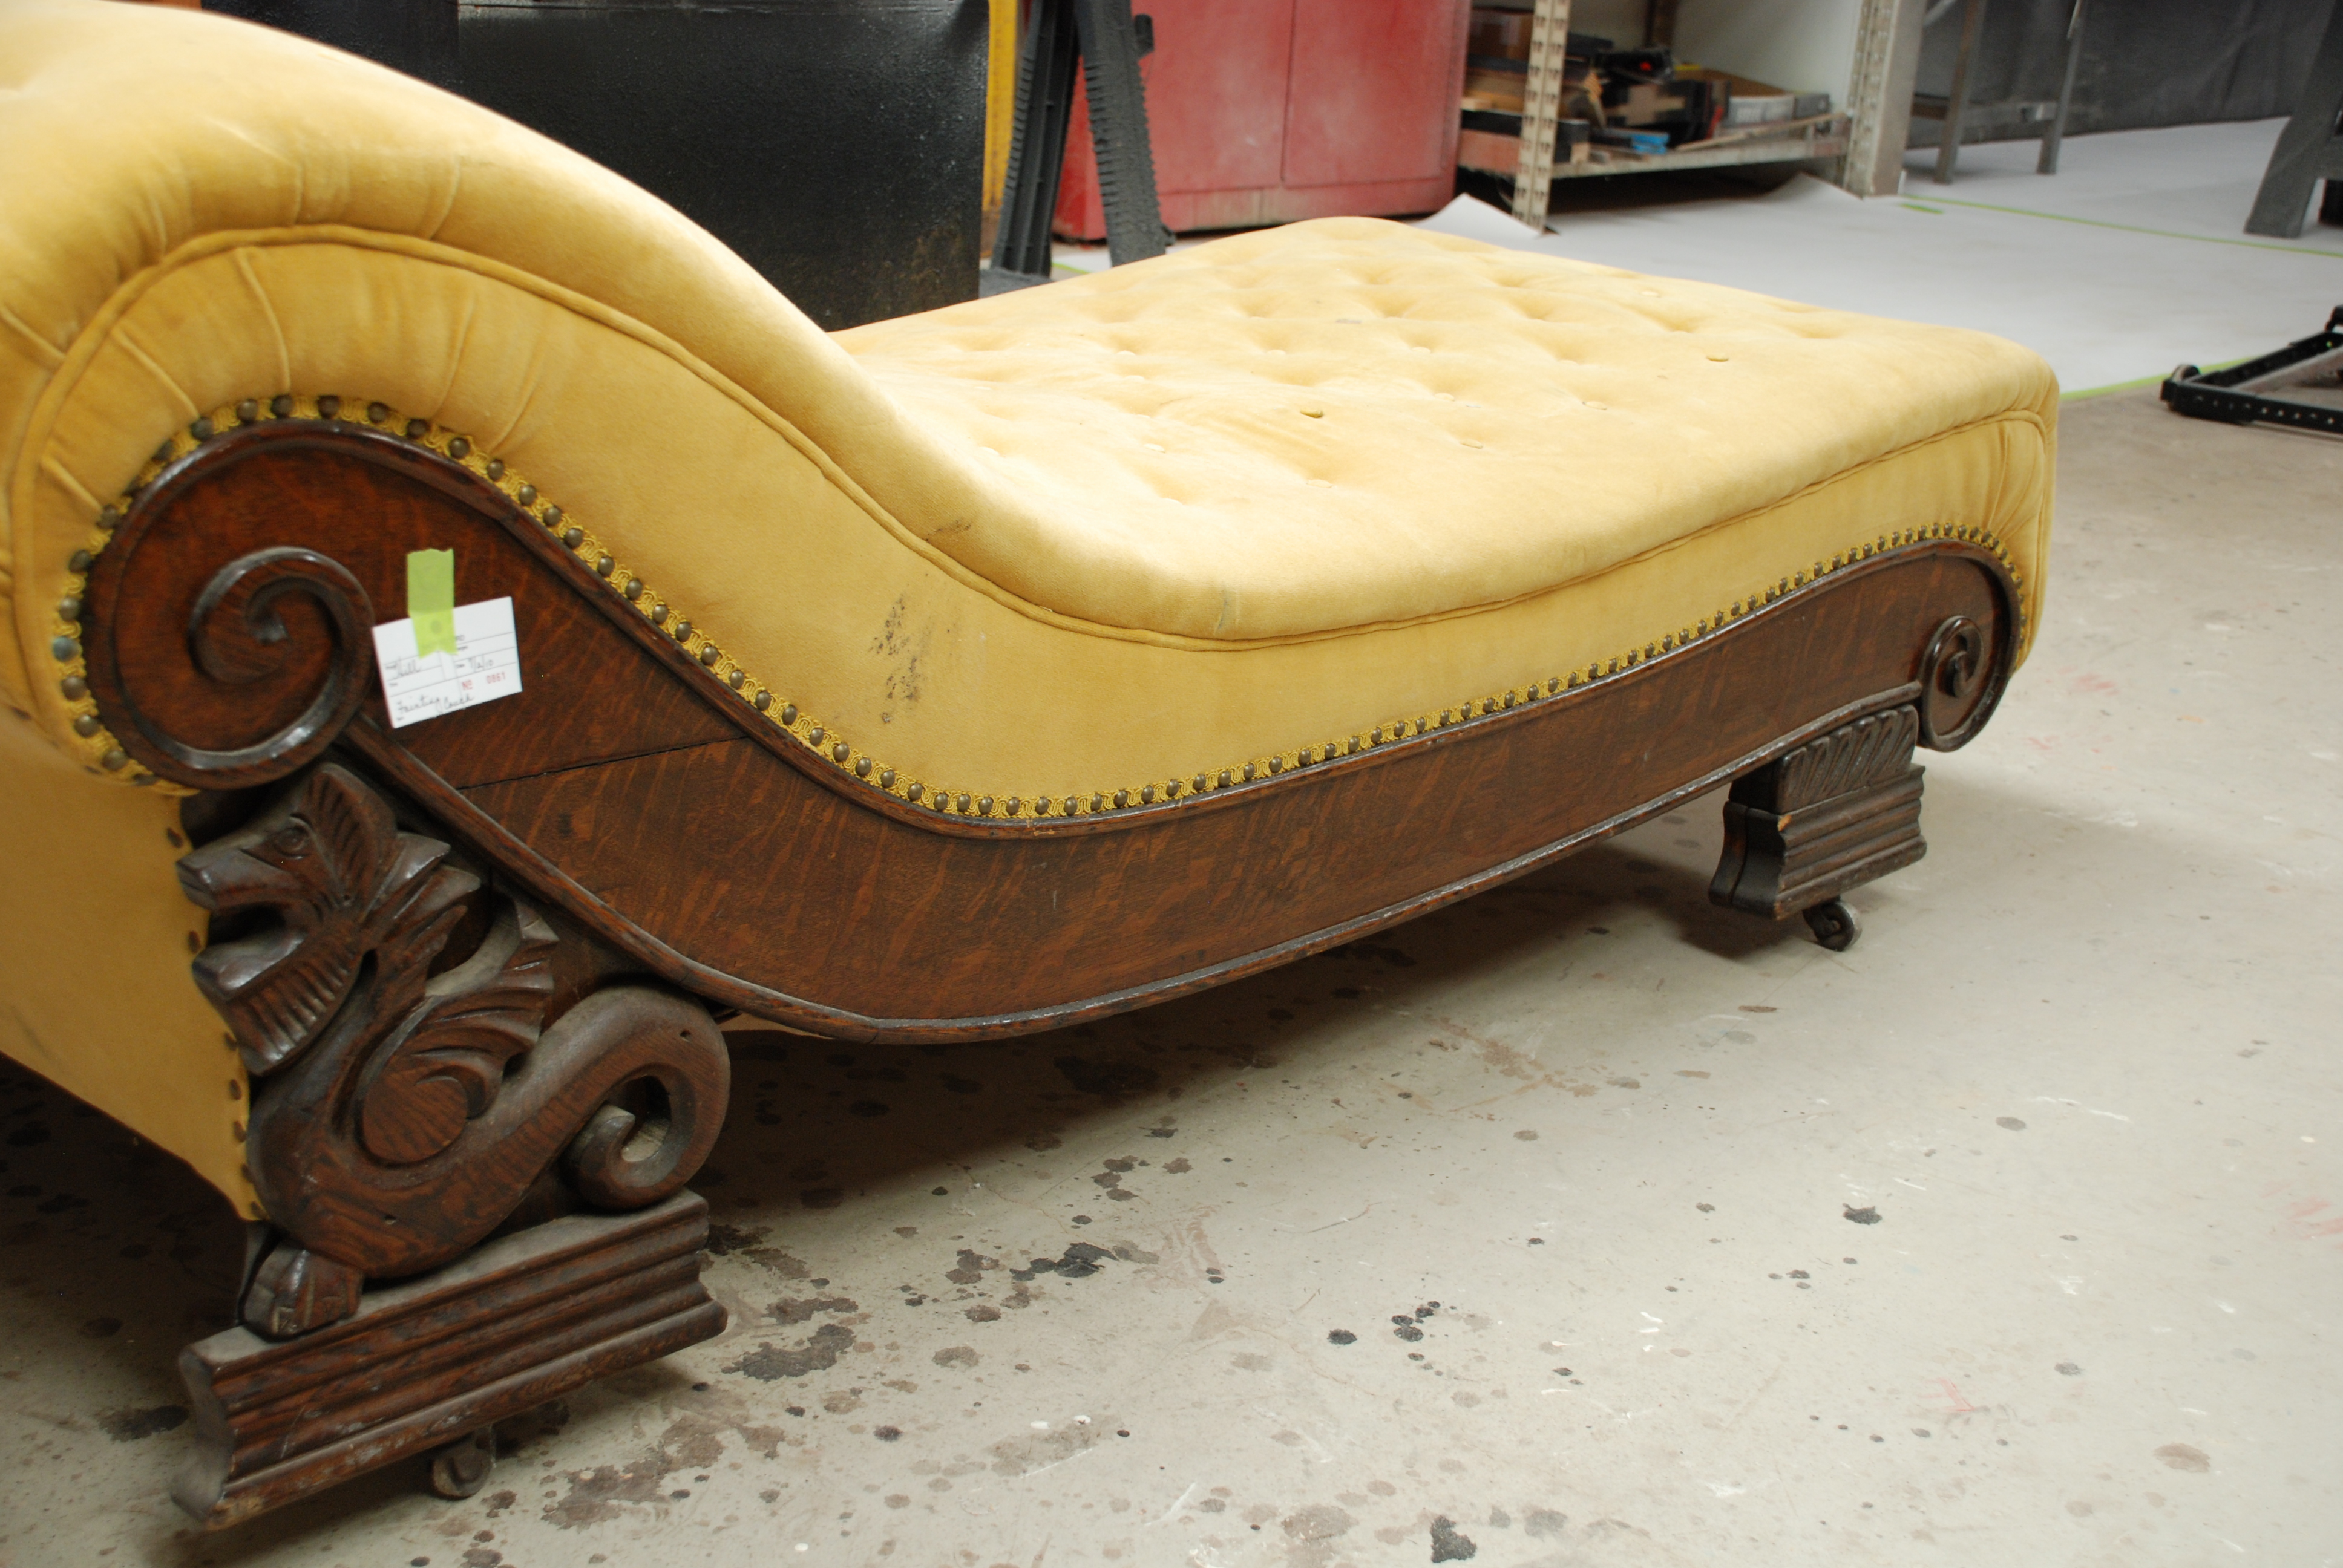 antique fainting couch value Famous Fainting Couch Antiques #OC79 – Roccommunity antique fainting couch value